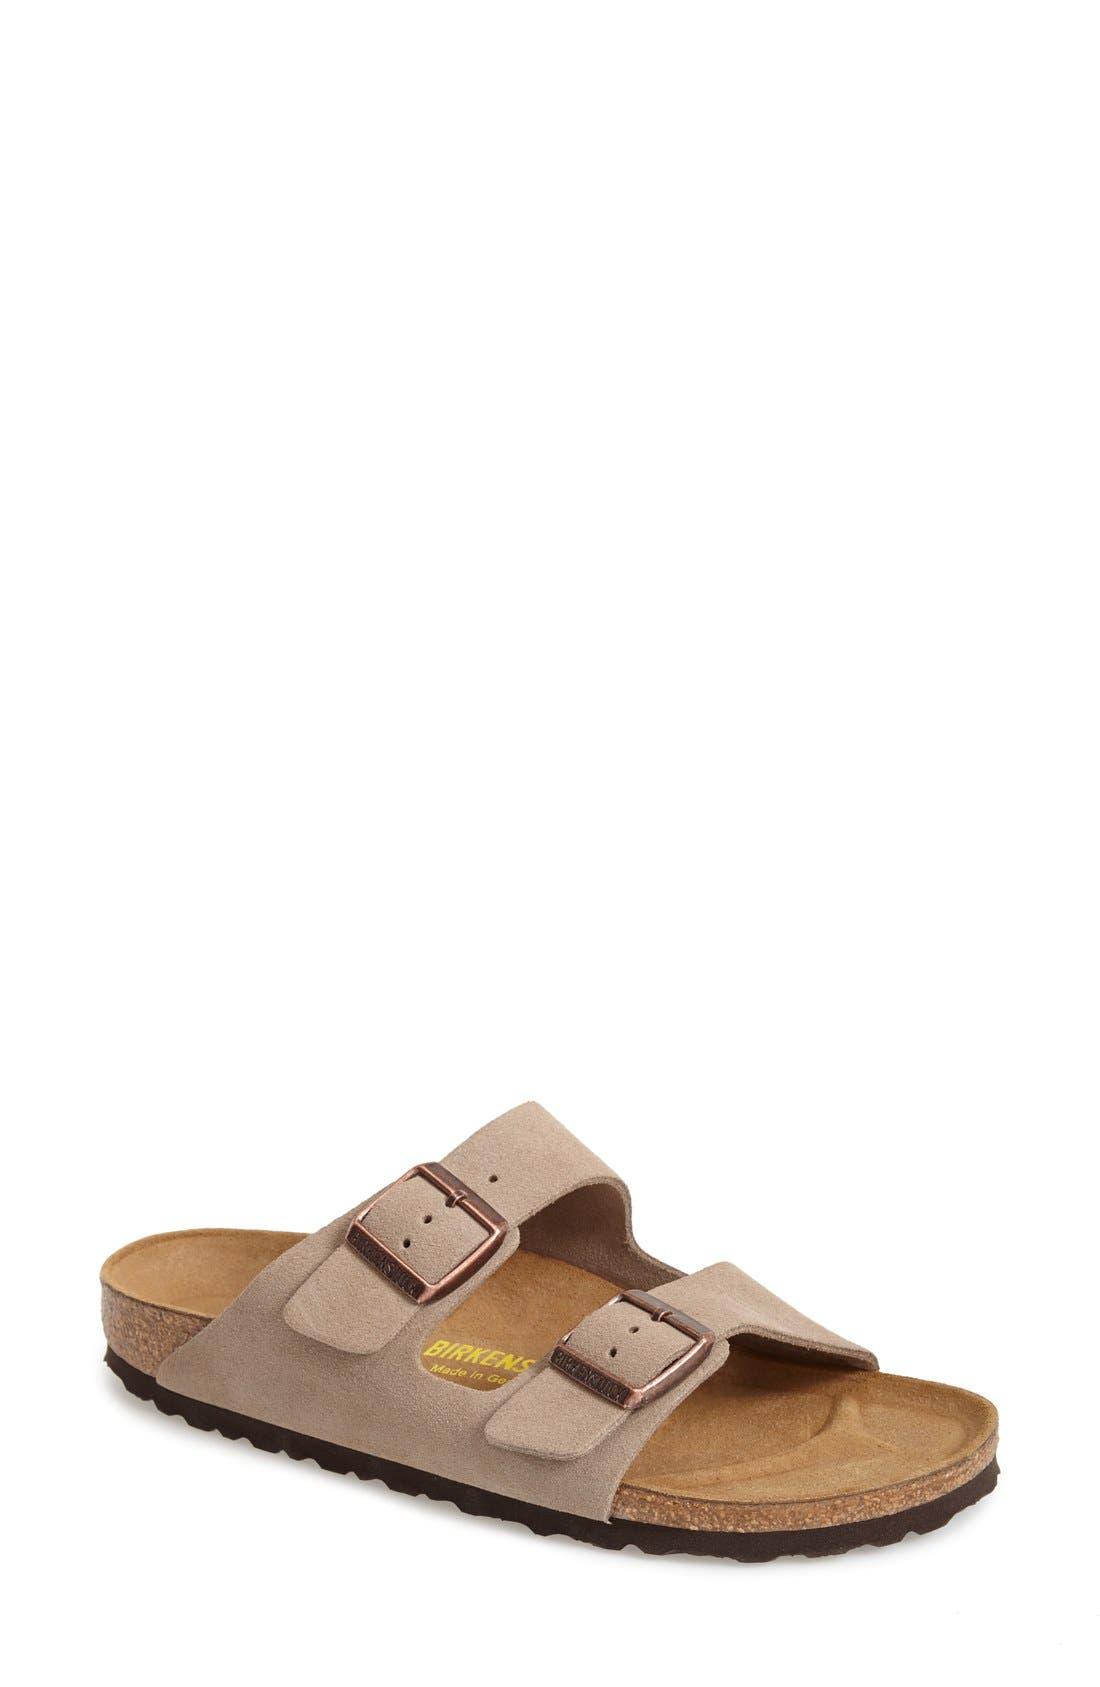 Main Image - Birkenstock 'Arizona' Sandal (Women)